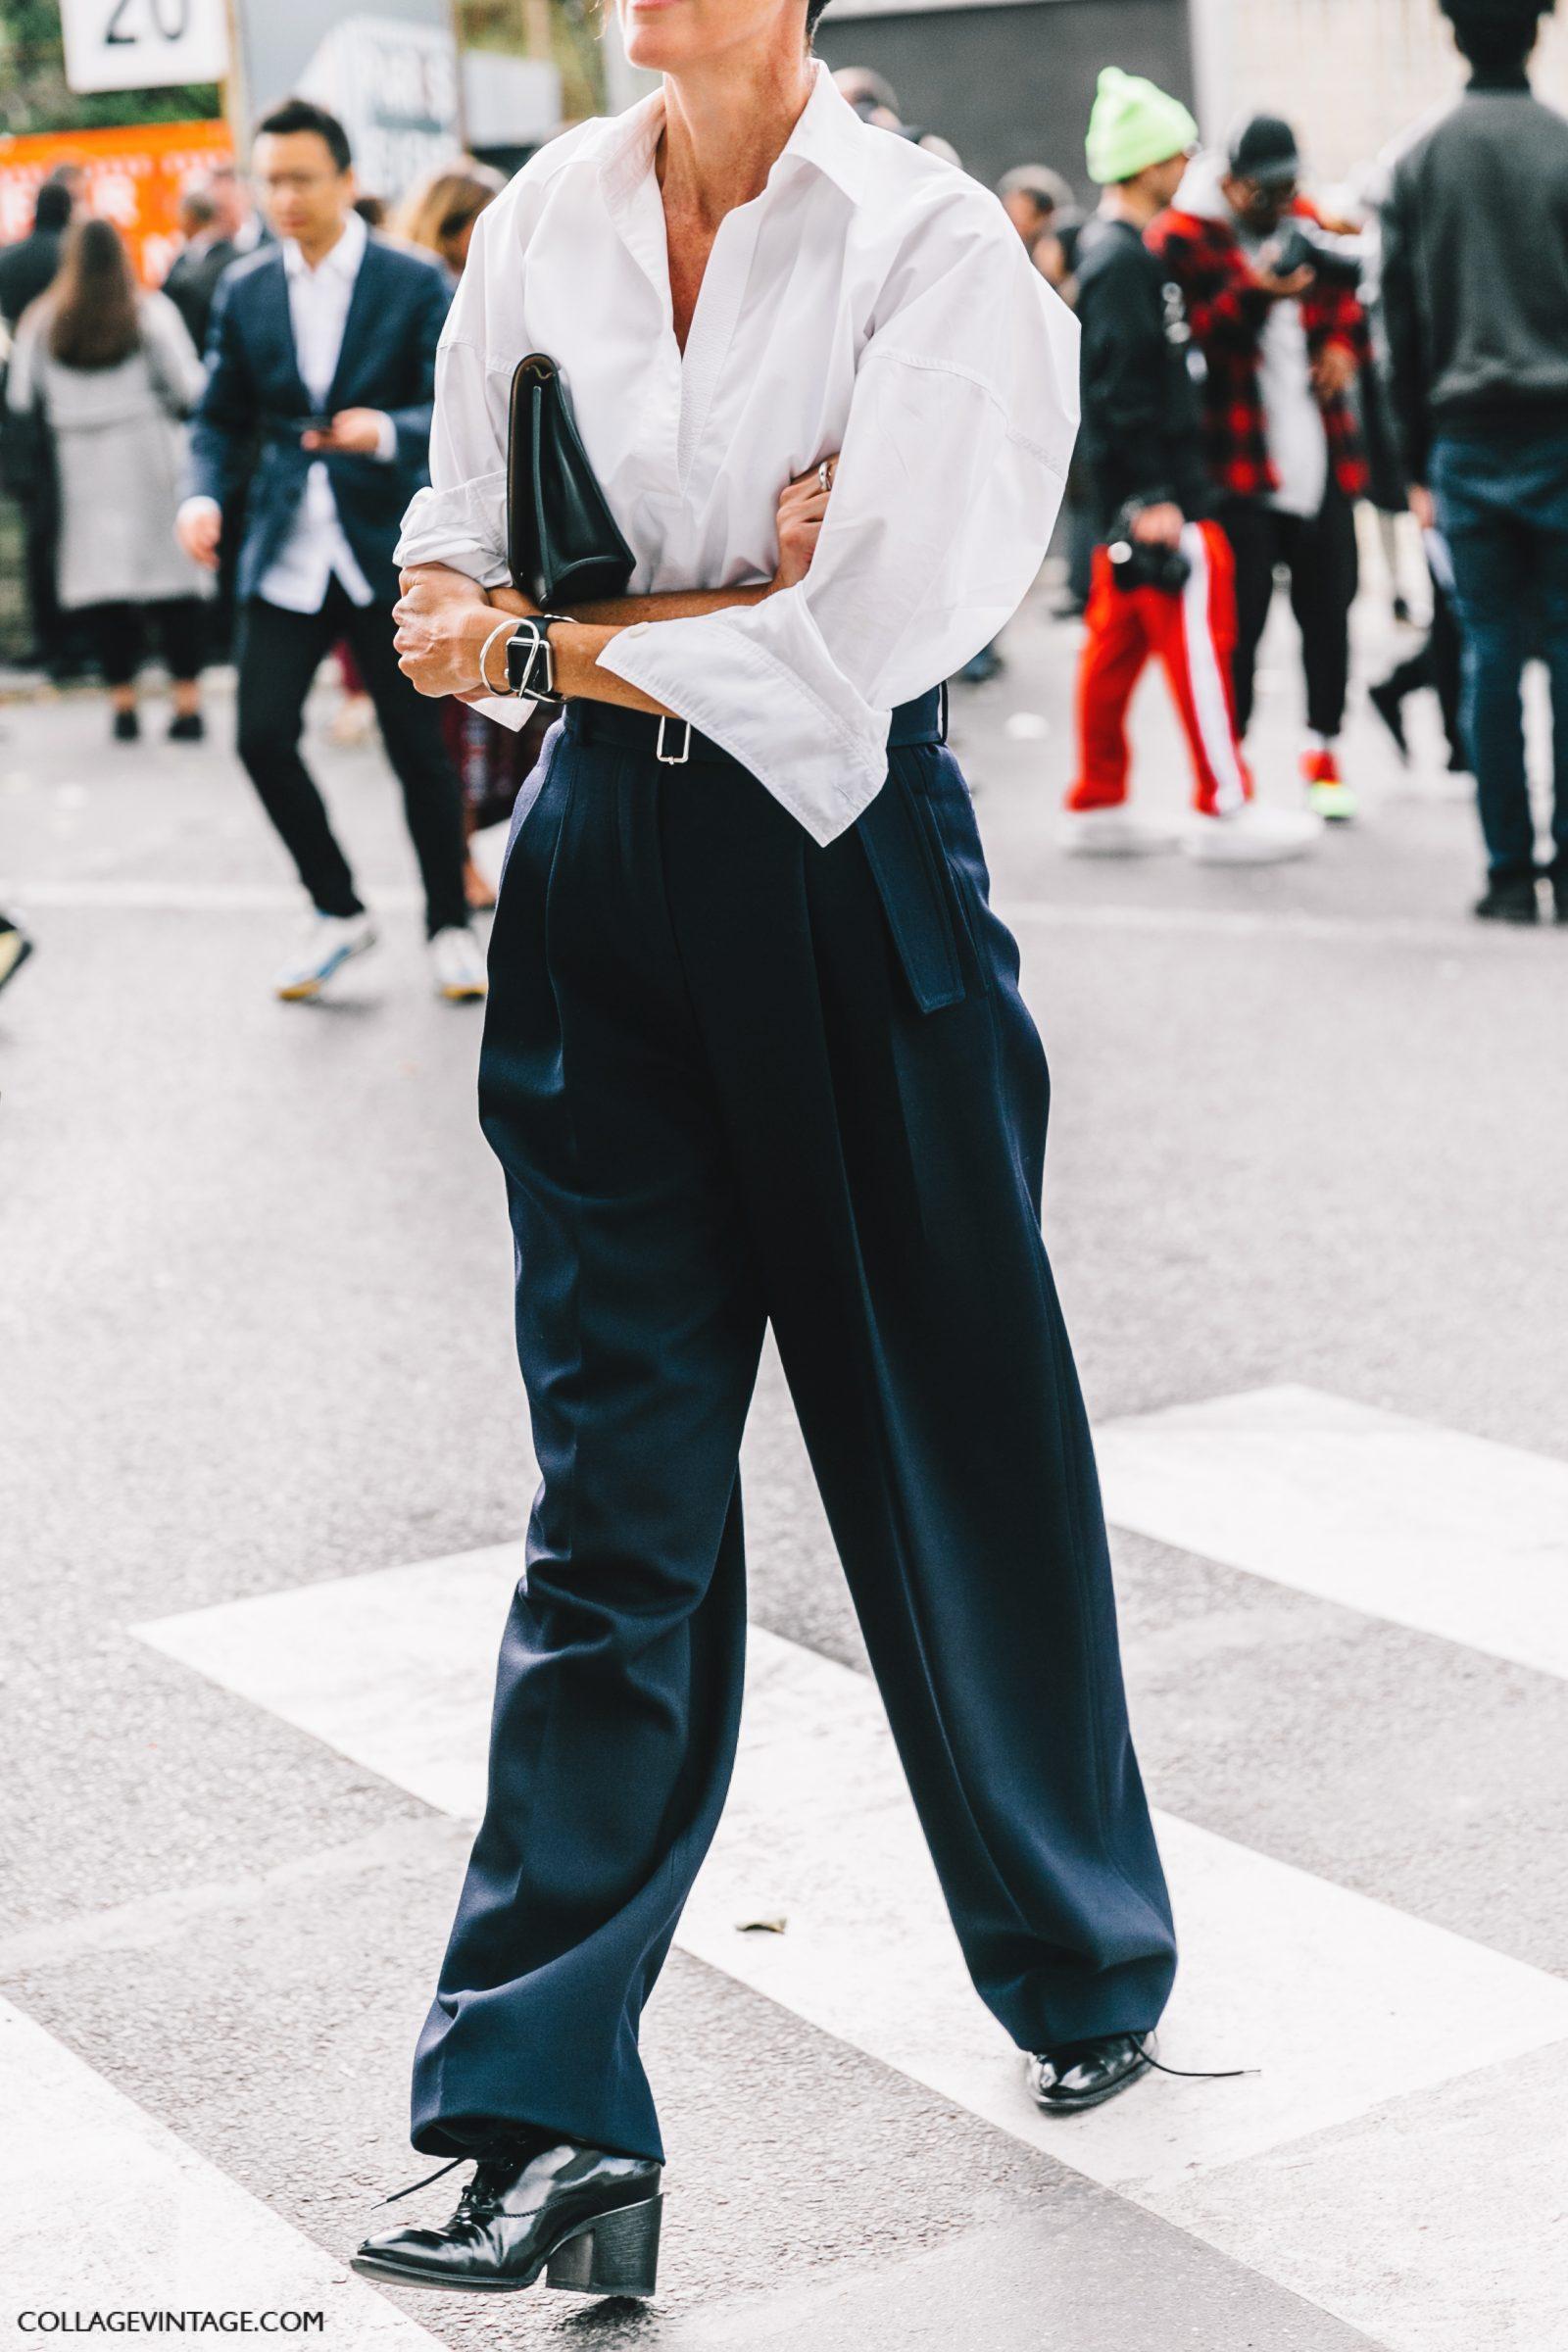 pfw-paris_fashion_week_ss17-street_style-outfits-collage_vintage-valentino-balenciaga-celine-51